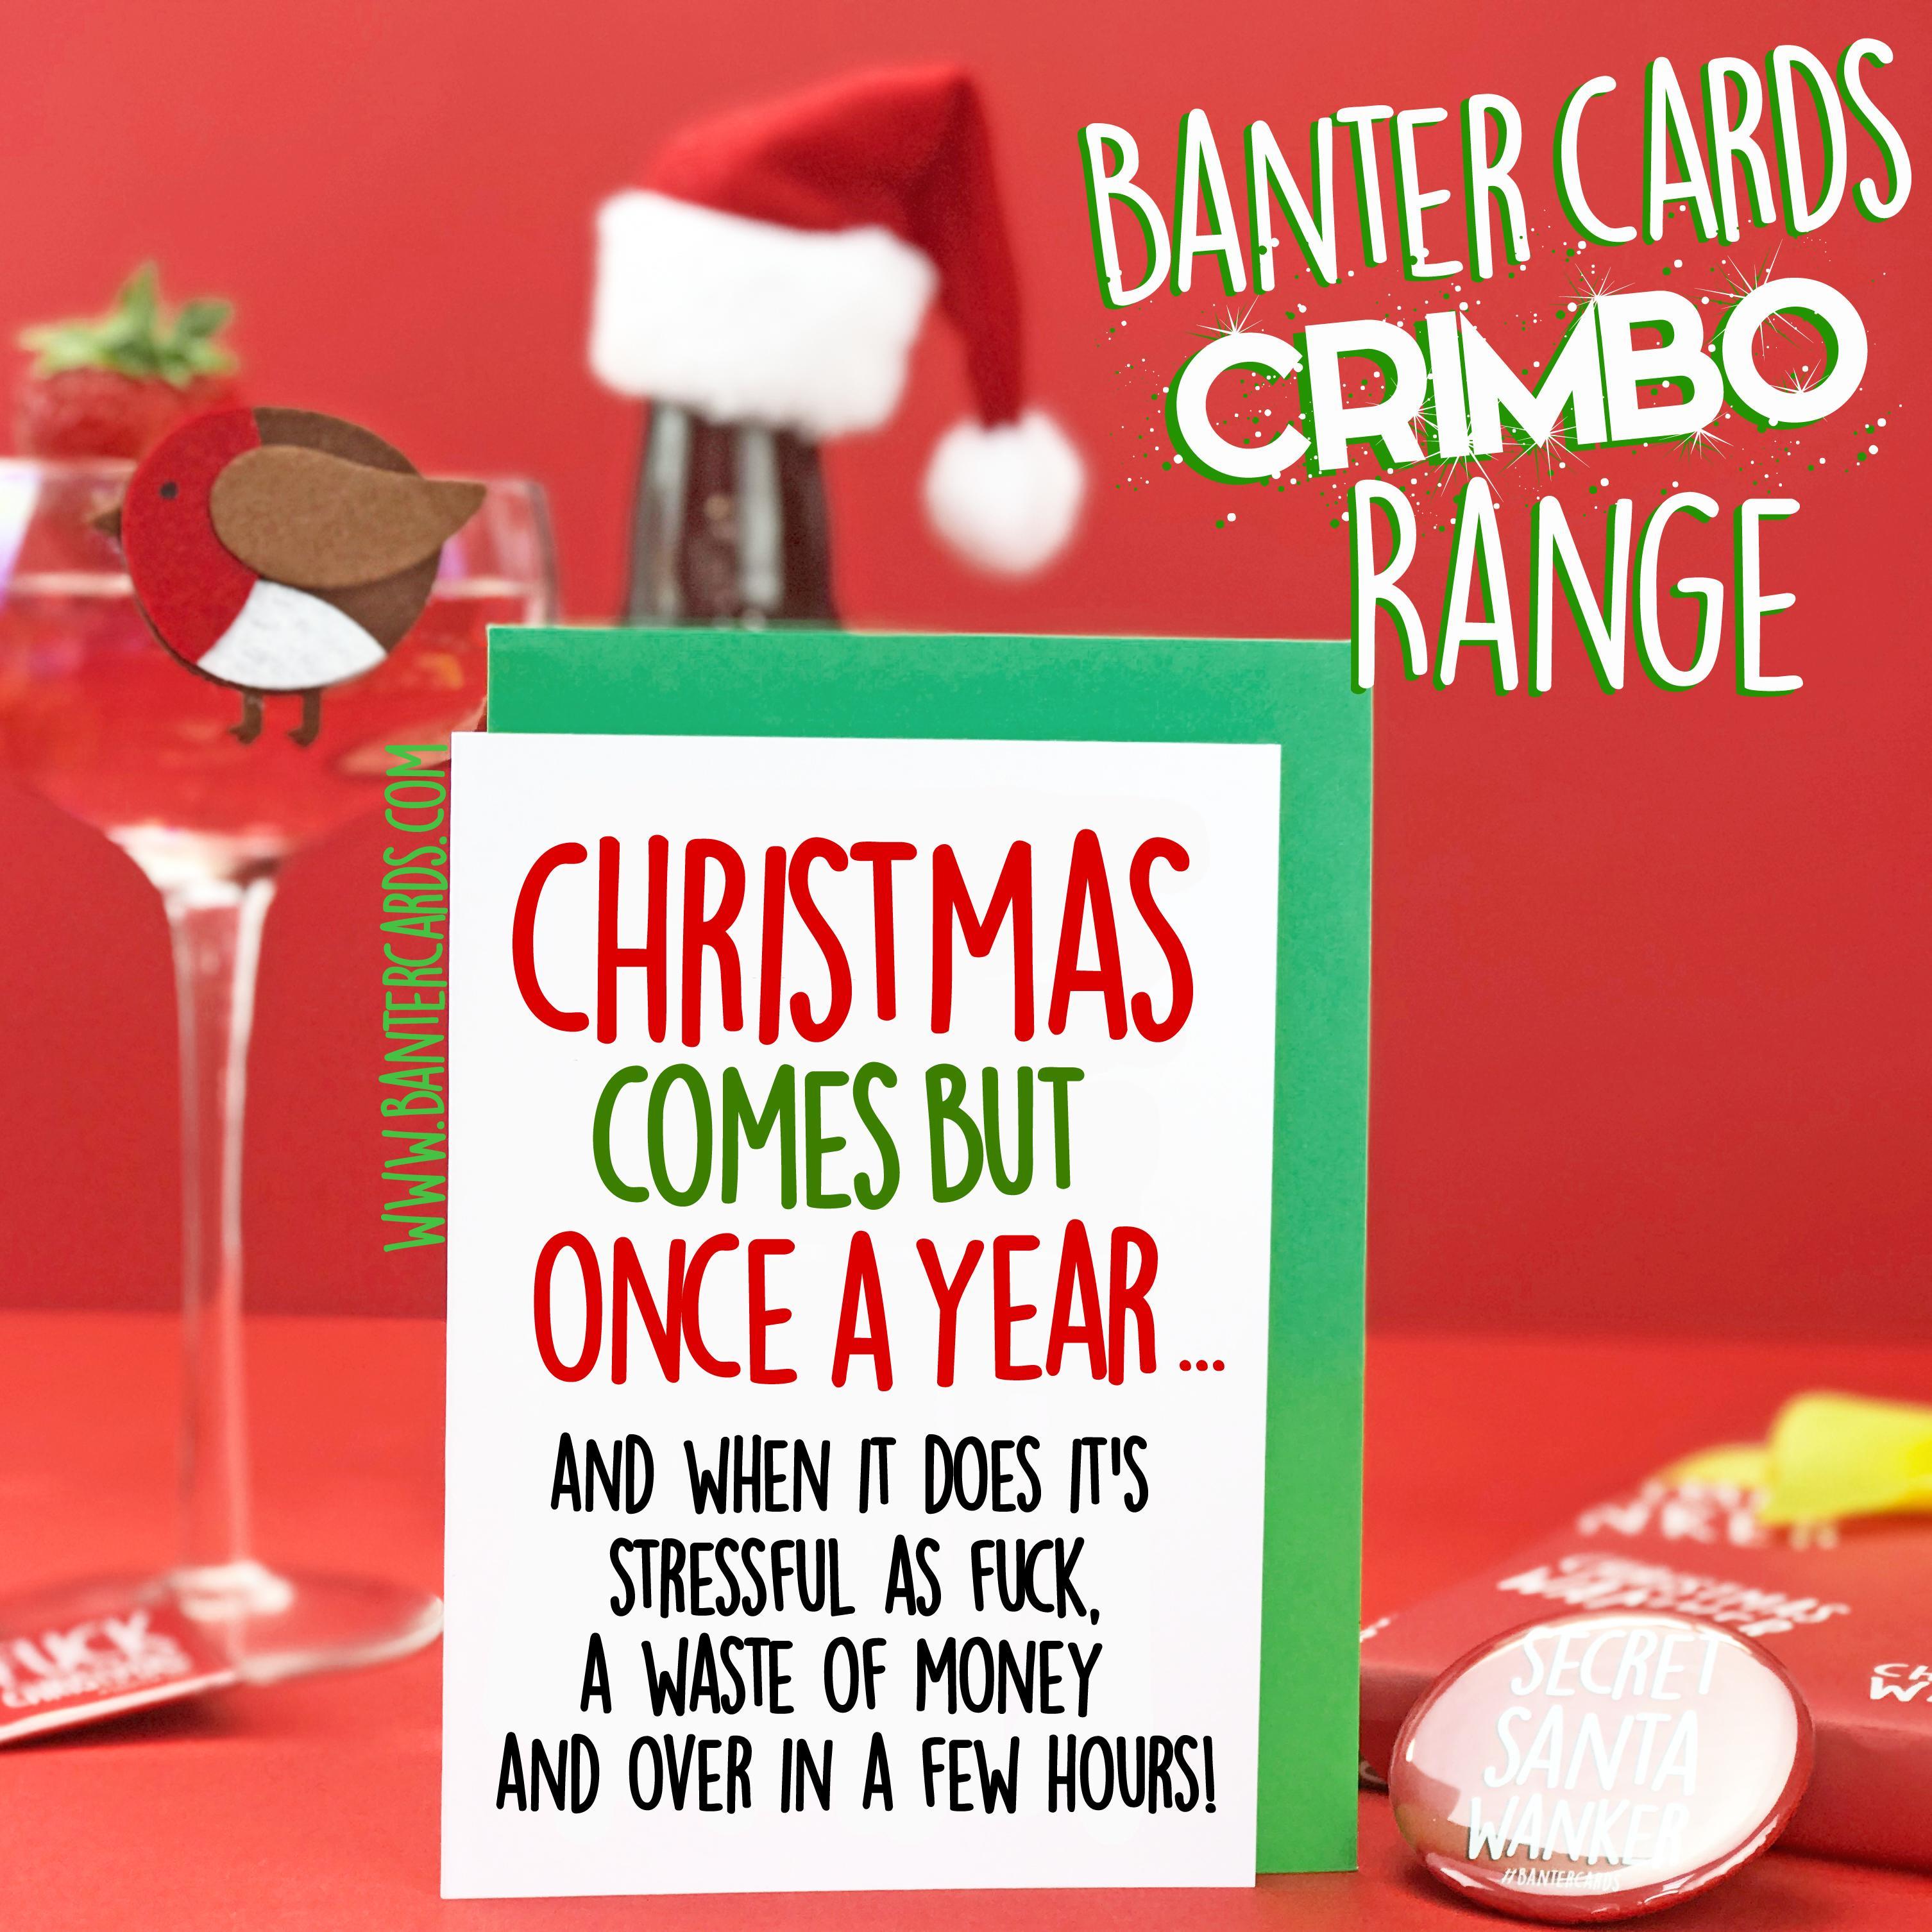 Christmas Comes But Once A Year.Christmas Comes But Once A Year Funny Christmas Card Fb